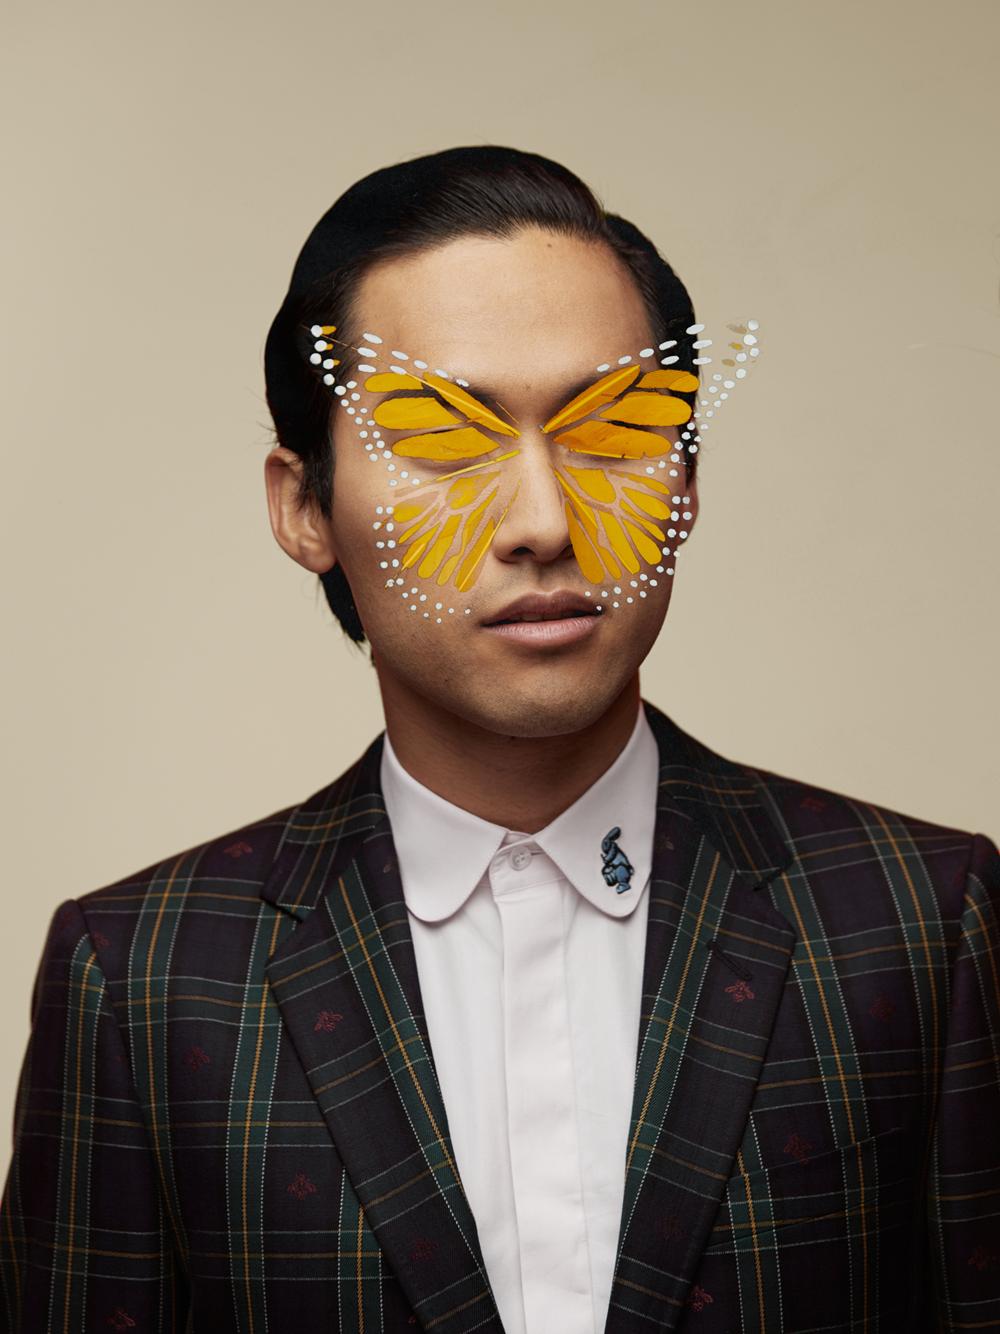 Jin Ha